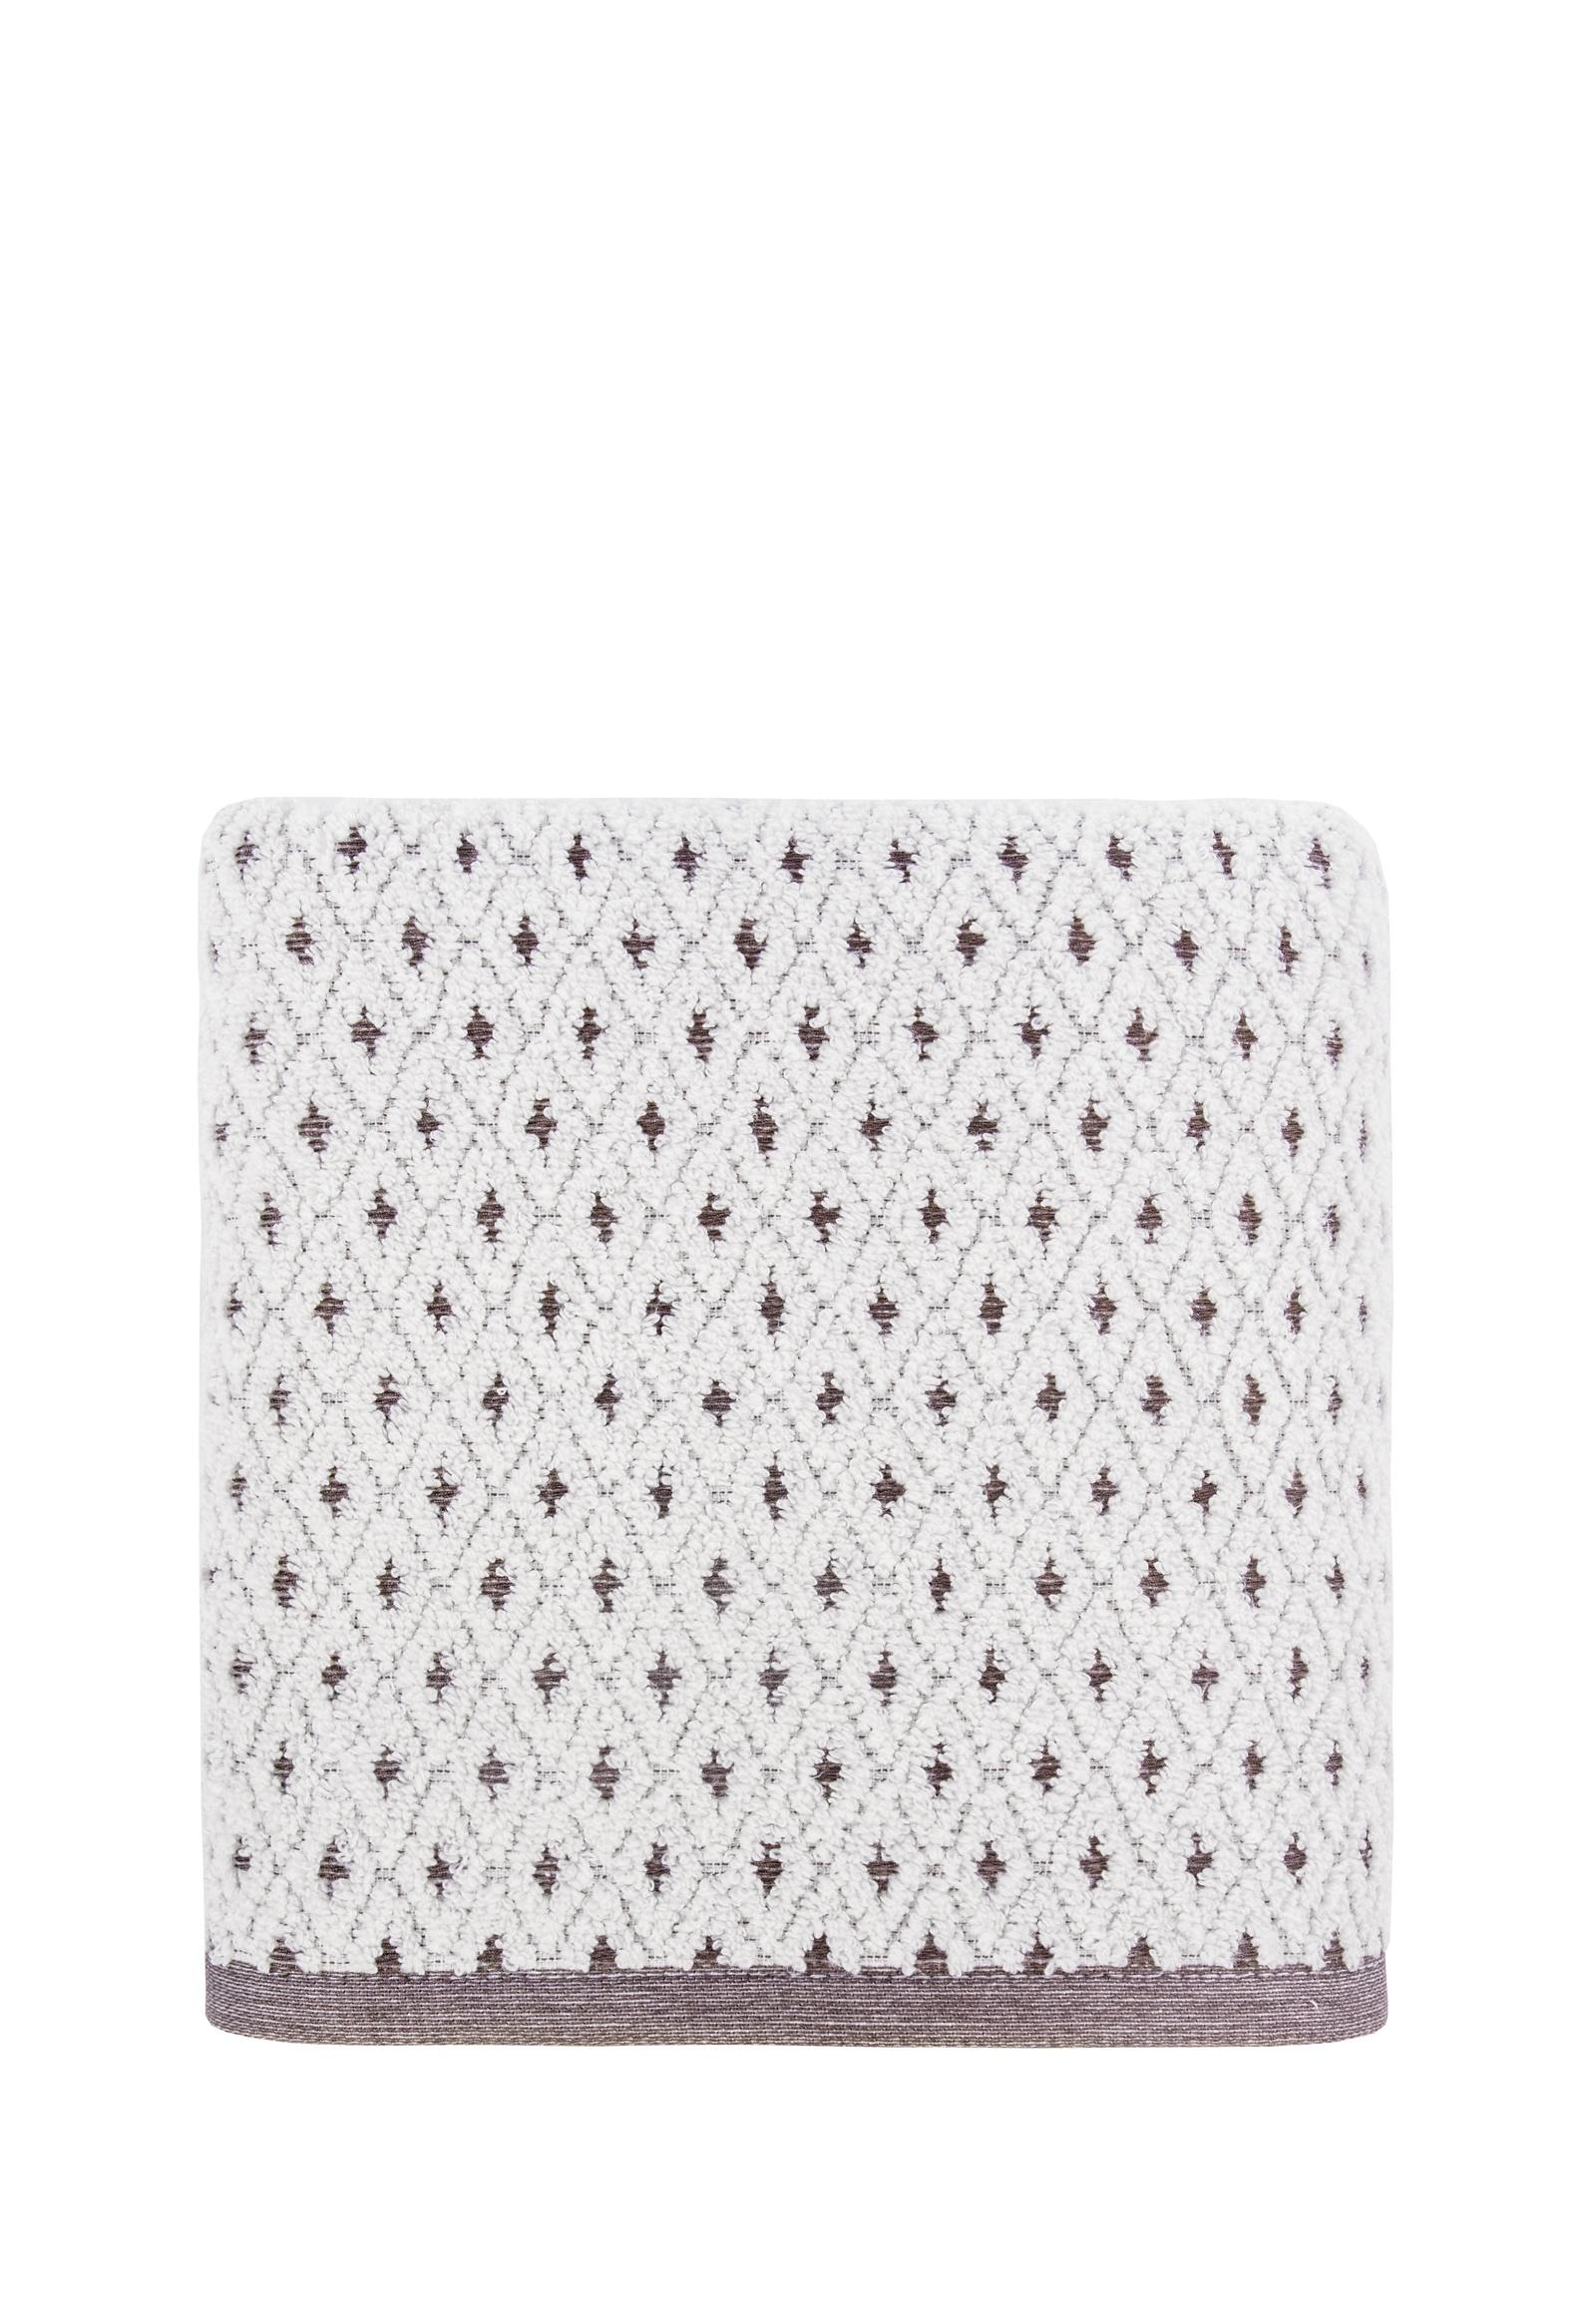 Фото - Полотенце банное Arya home collection Finn кремовый, кремовый полотенца arya полотенце жаккард arya levi бежевый 70 140 см